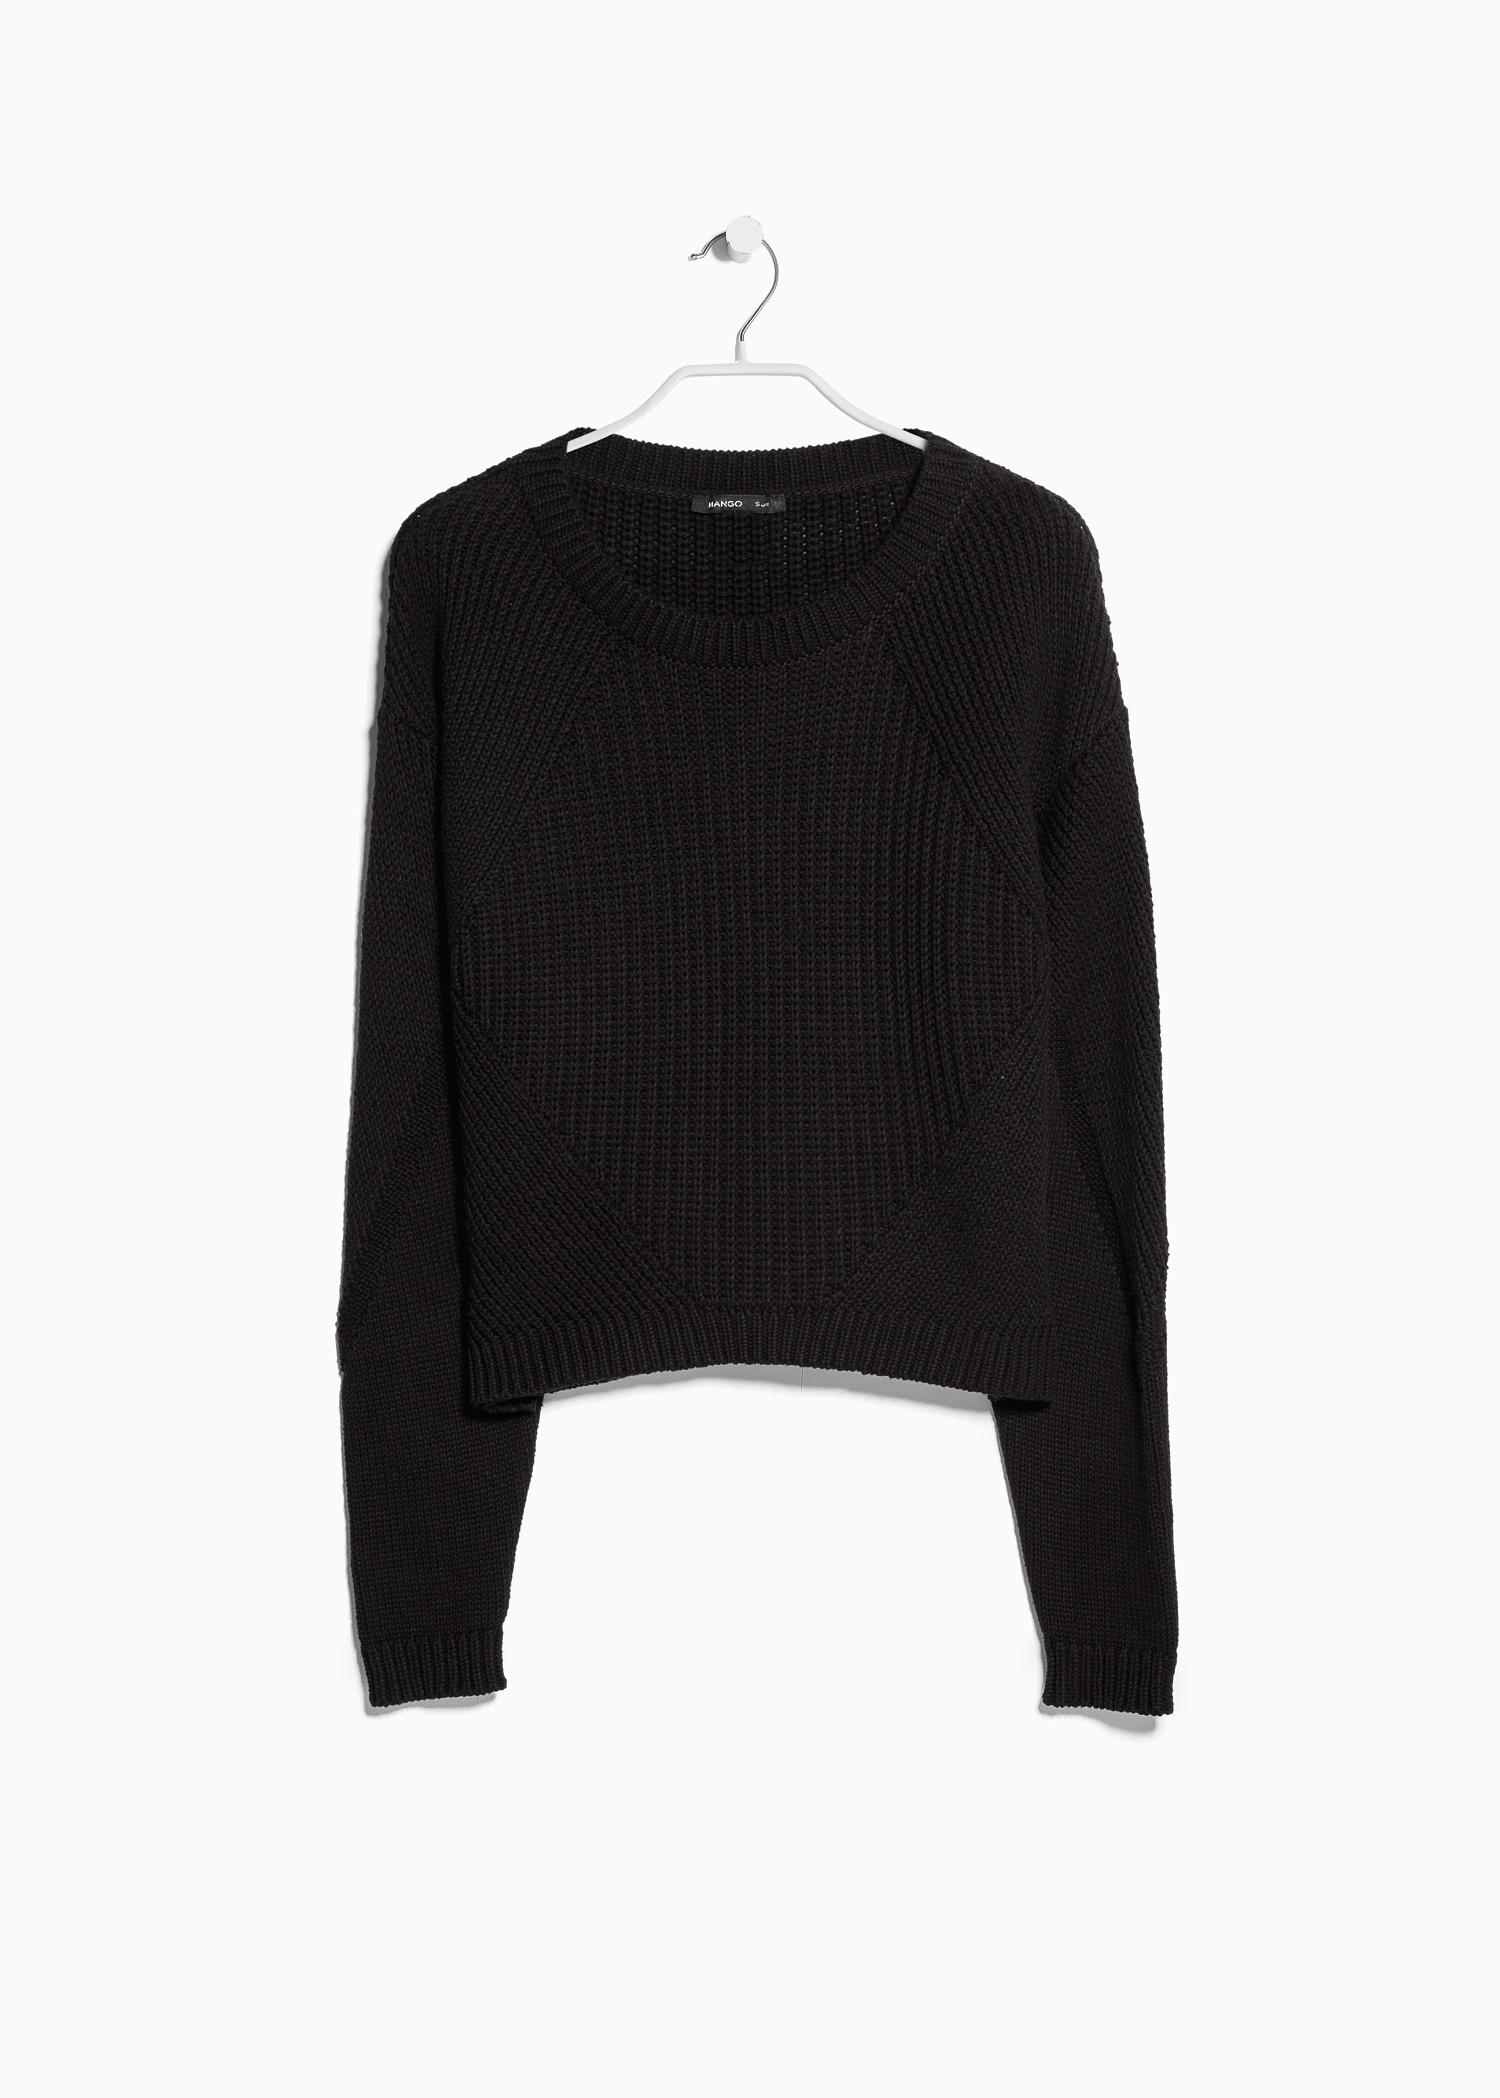 59cb95434e Lyst - Mango Chunky-Knit Sweater in Black